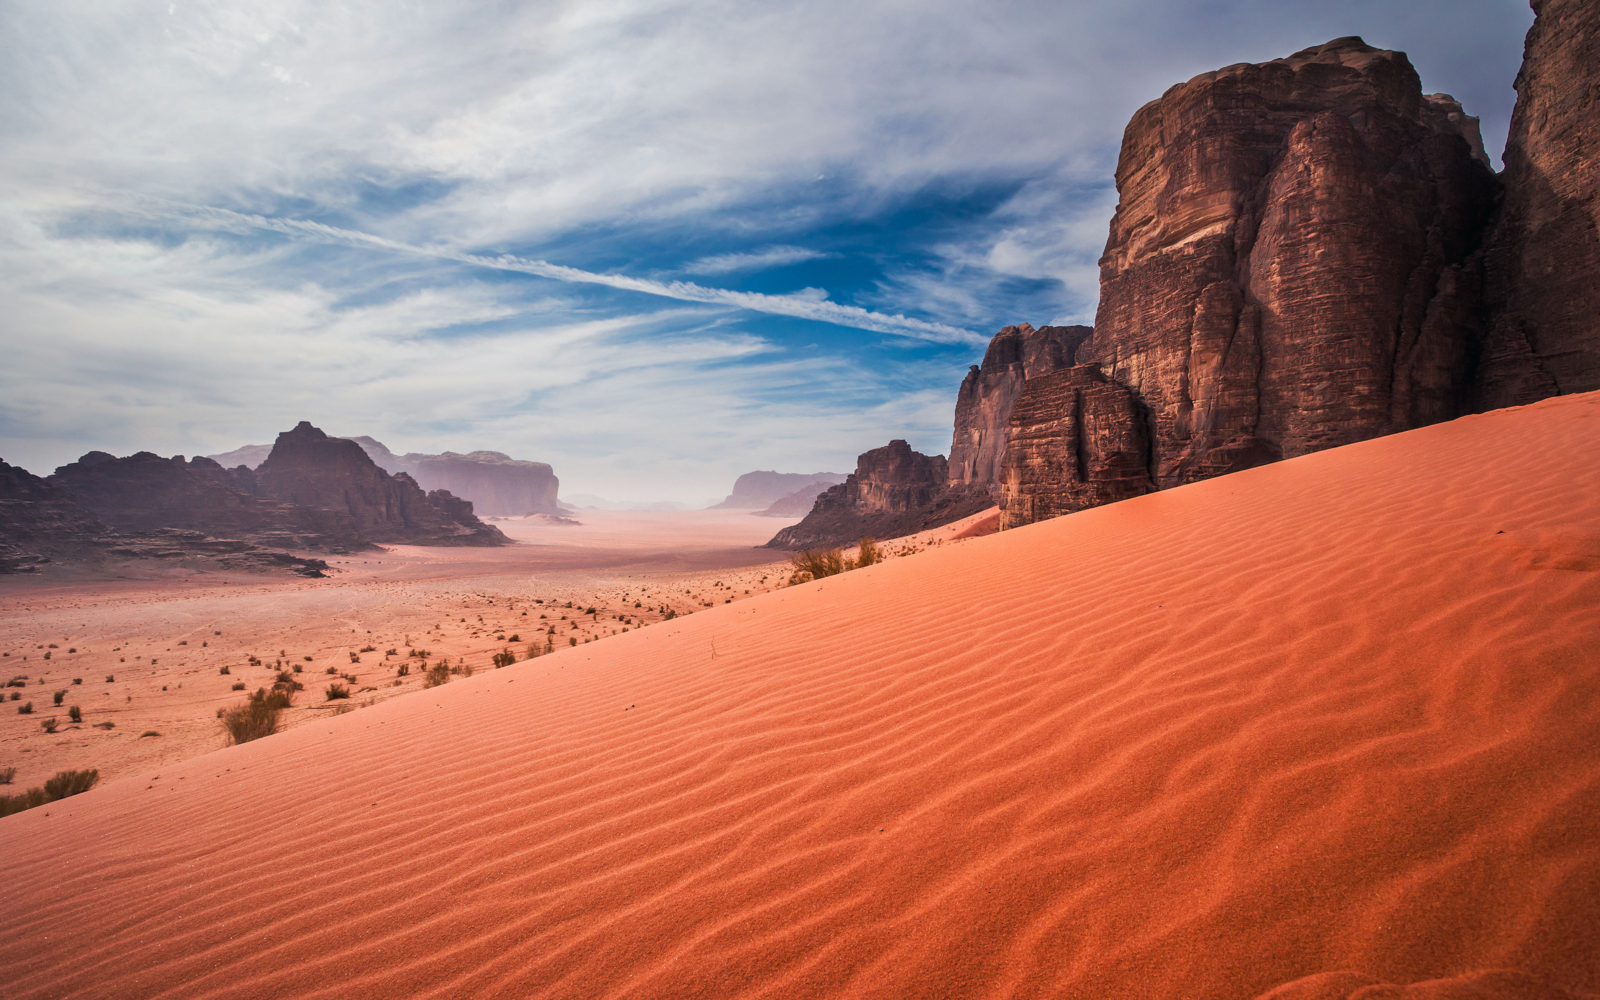 Avventurarsi in Giordania nel deserto del Wadi Rum | Evaneos